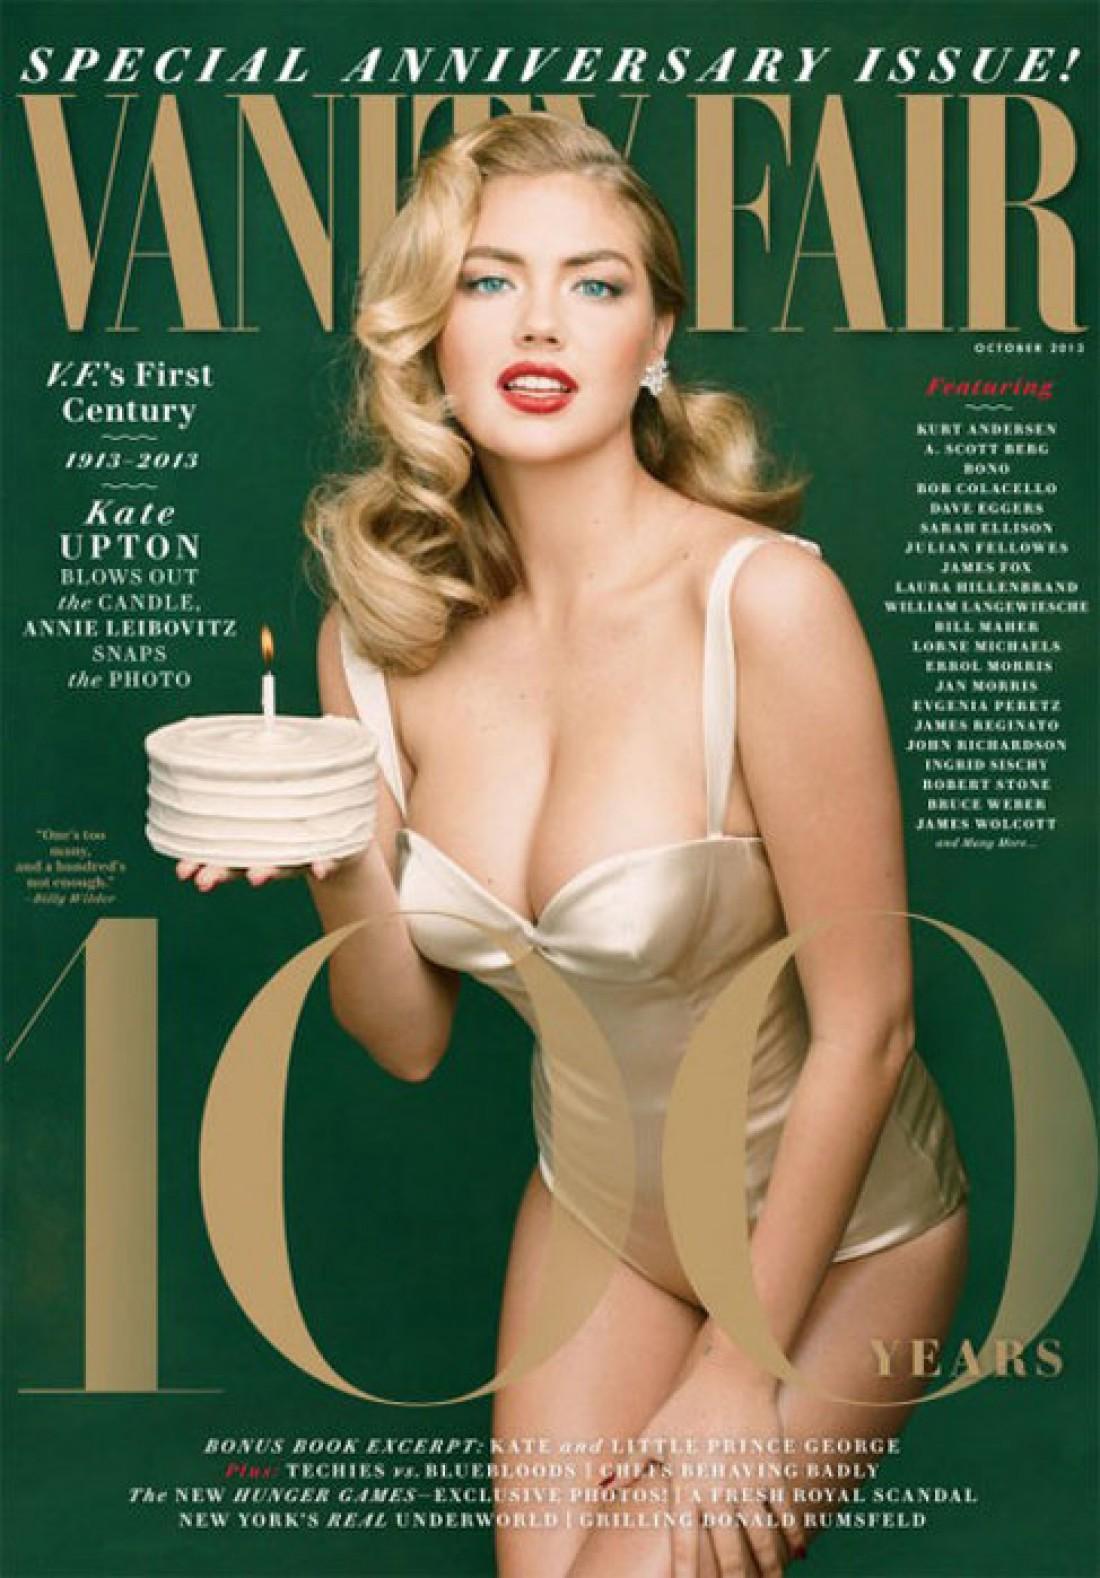 Кейт Аптон на обложке октябрьского выпуска журнала Vanity Fair